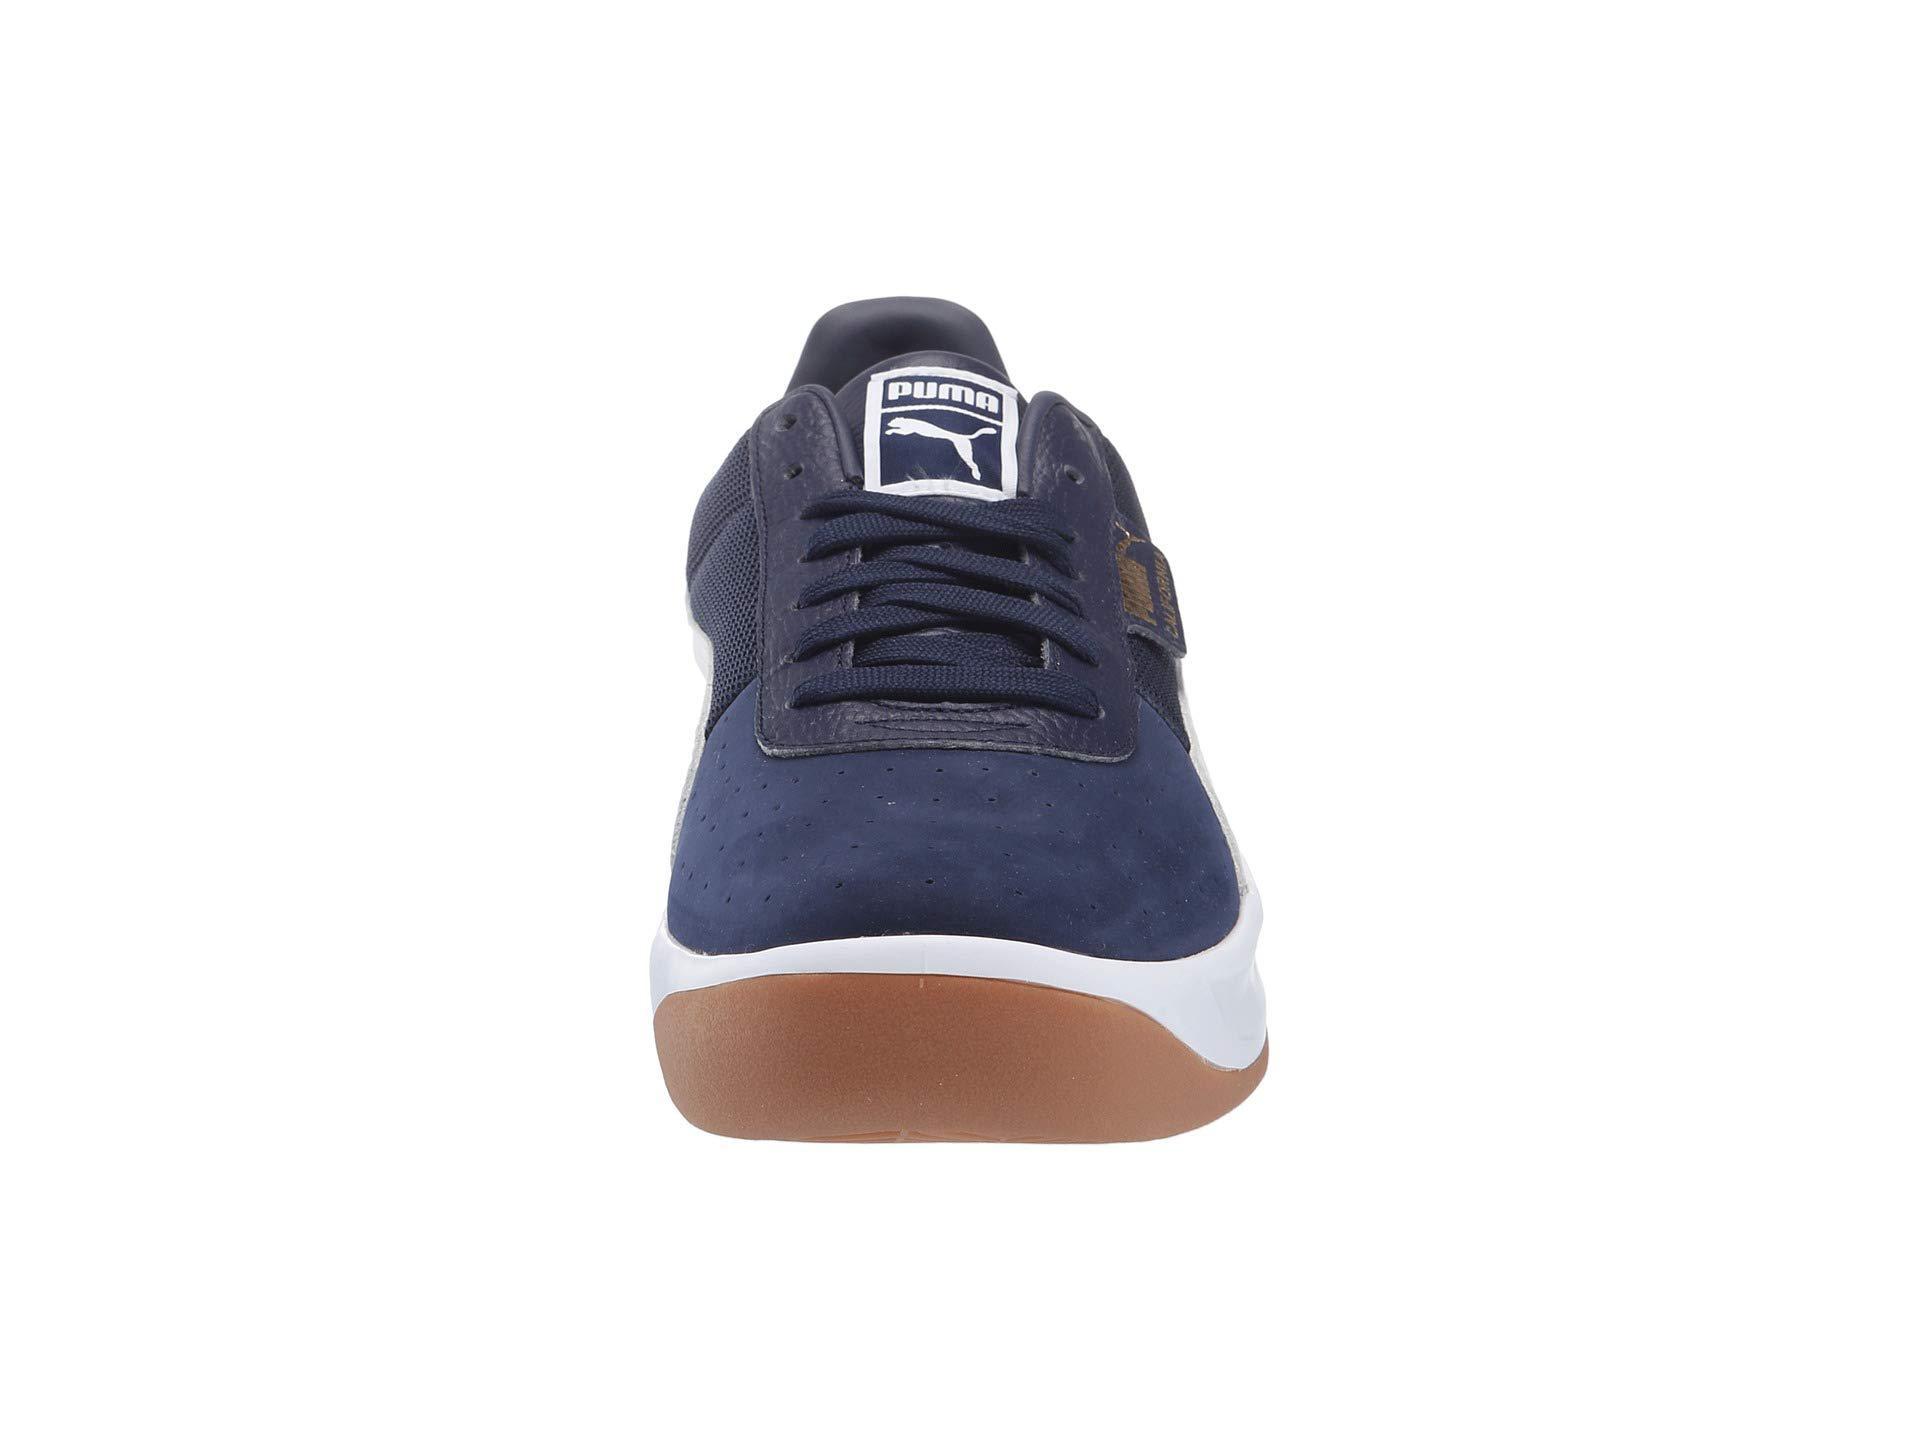 PUMA - California Casual ( White peacoat  White) Men s Shoes for Men -.  View fullscreen 5cecb4971